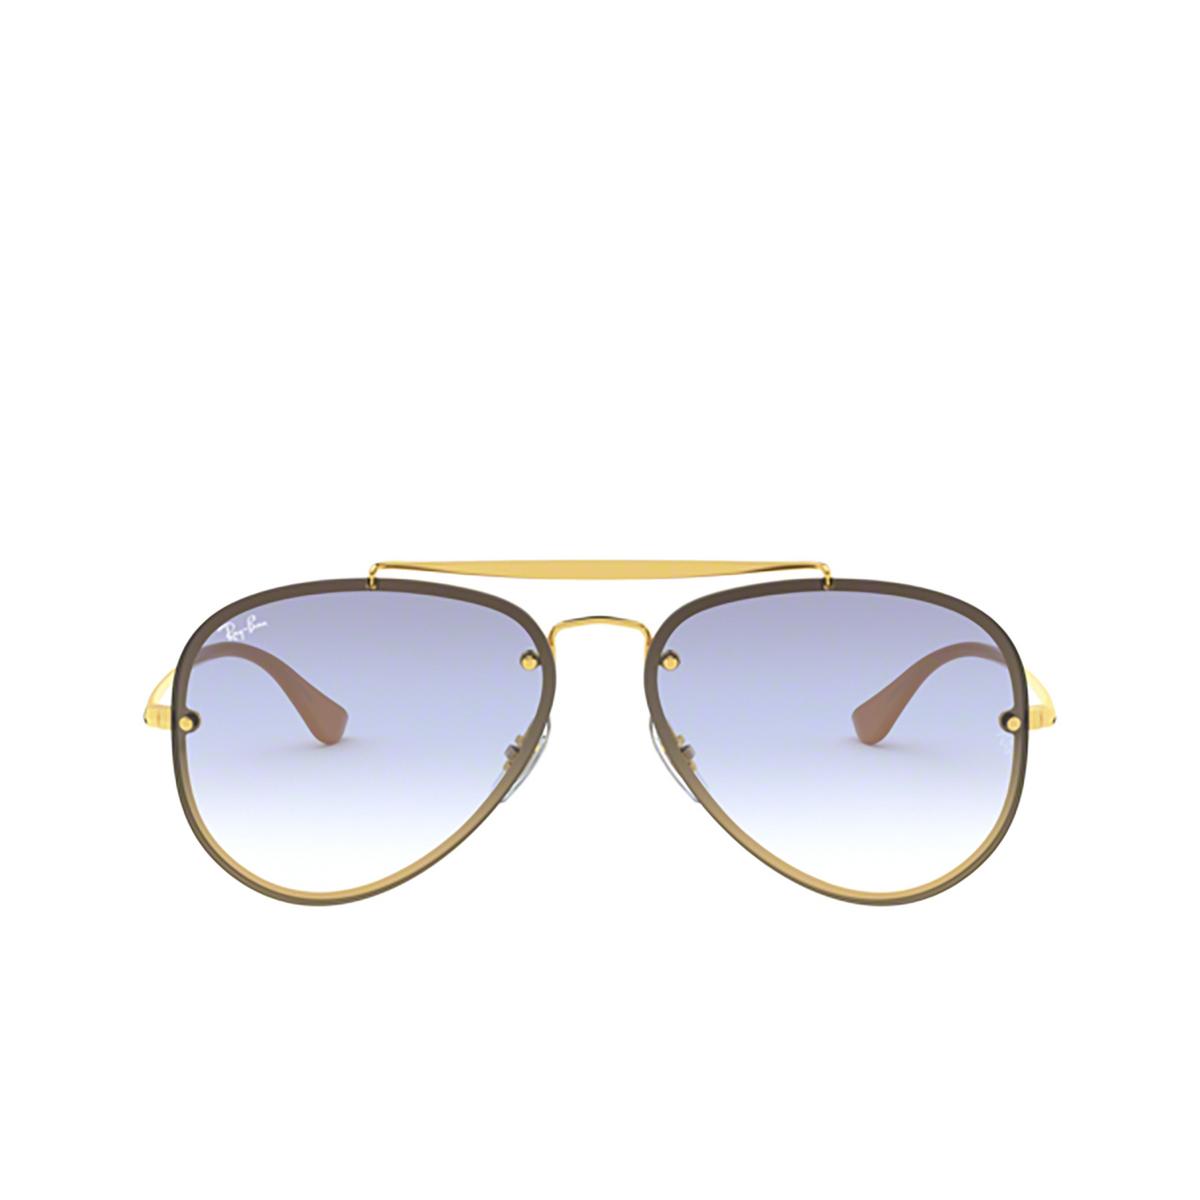 Ray-Ban® Aviator Sunglasses: Blaze Aviator RB3584N color Arista 001/19 - 1/3.